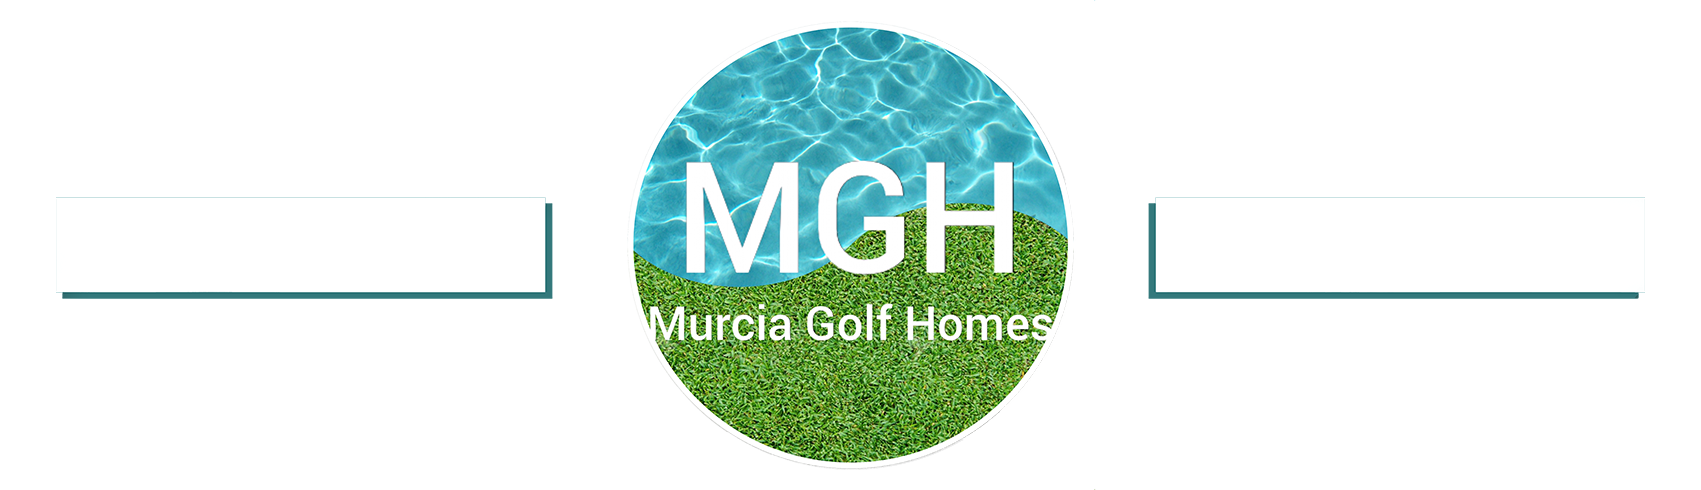 Murcia Golf Homes